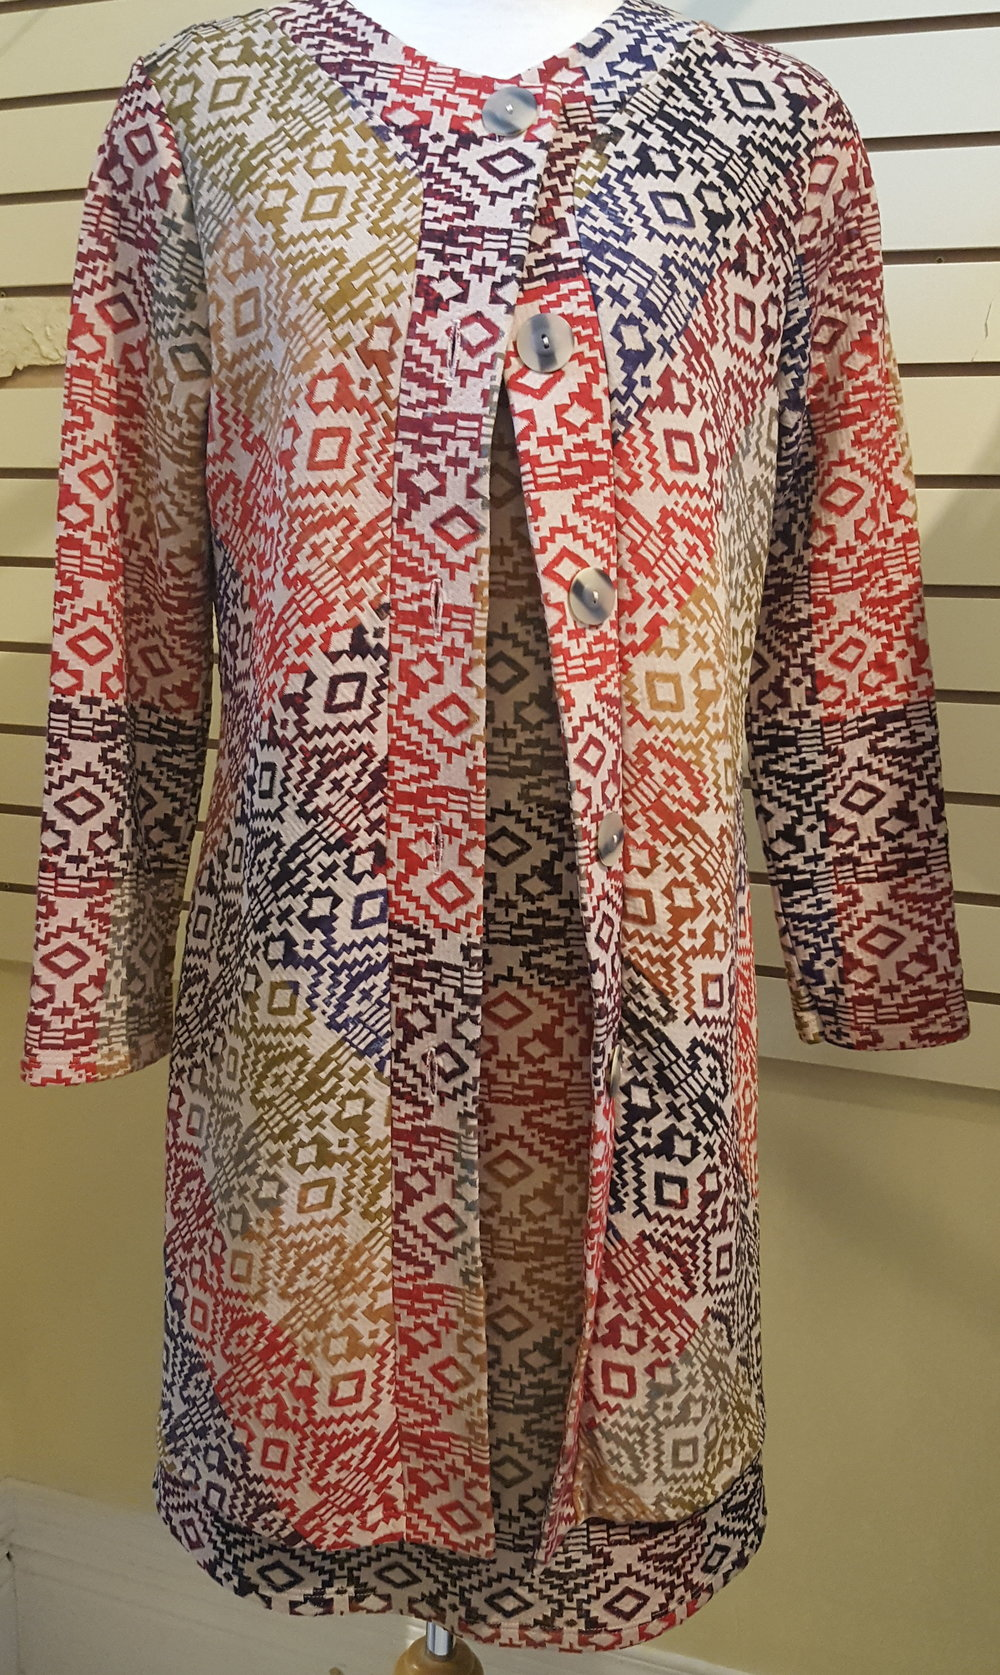 Dress shevless dress n coat Canadian madeB.jpg